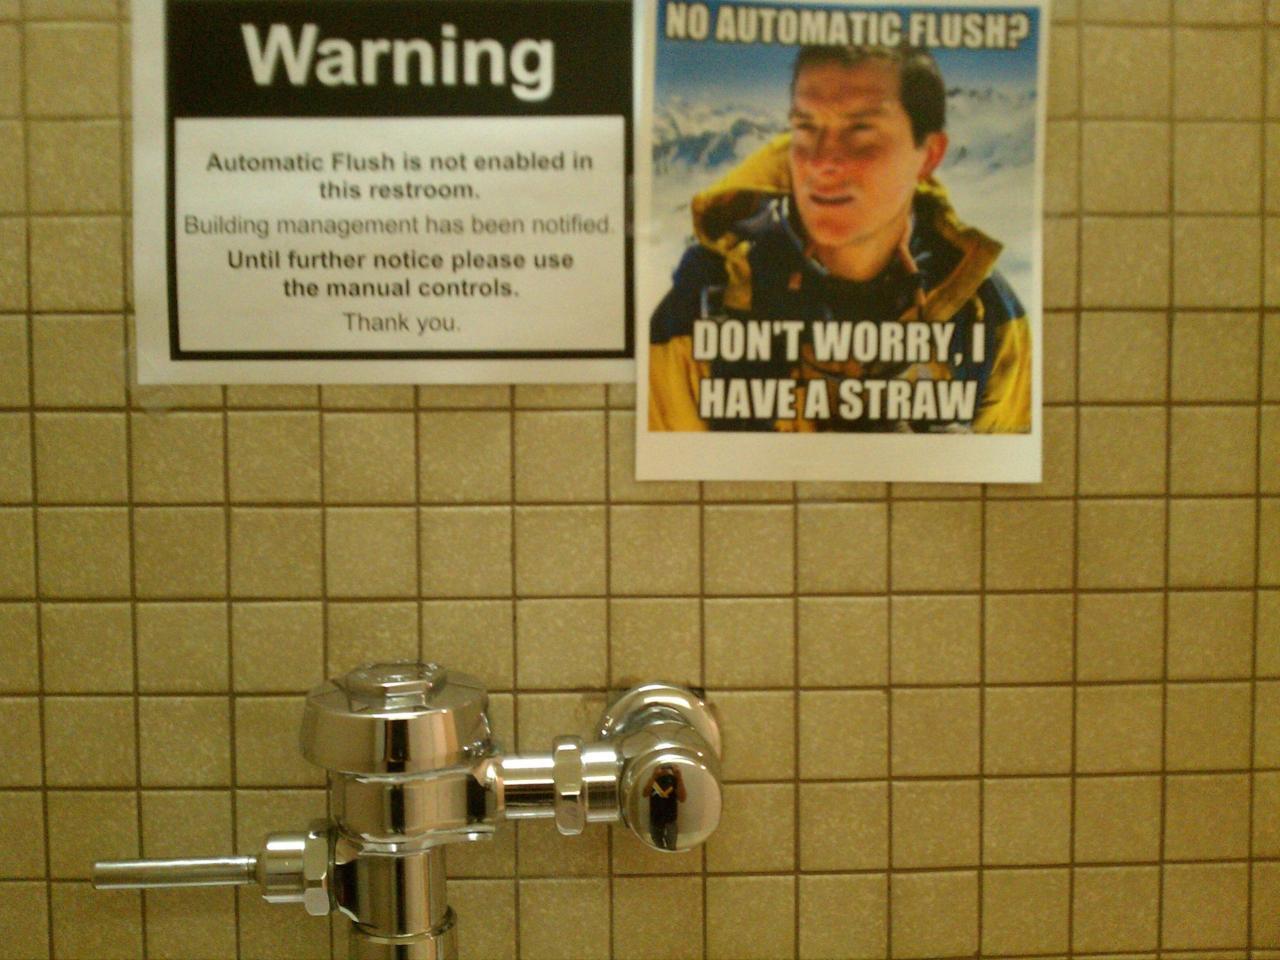 no automatic flush - pichars.org